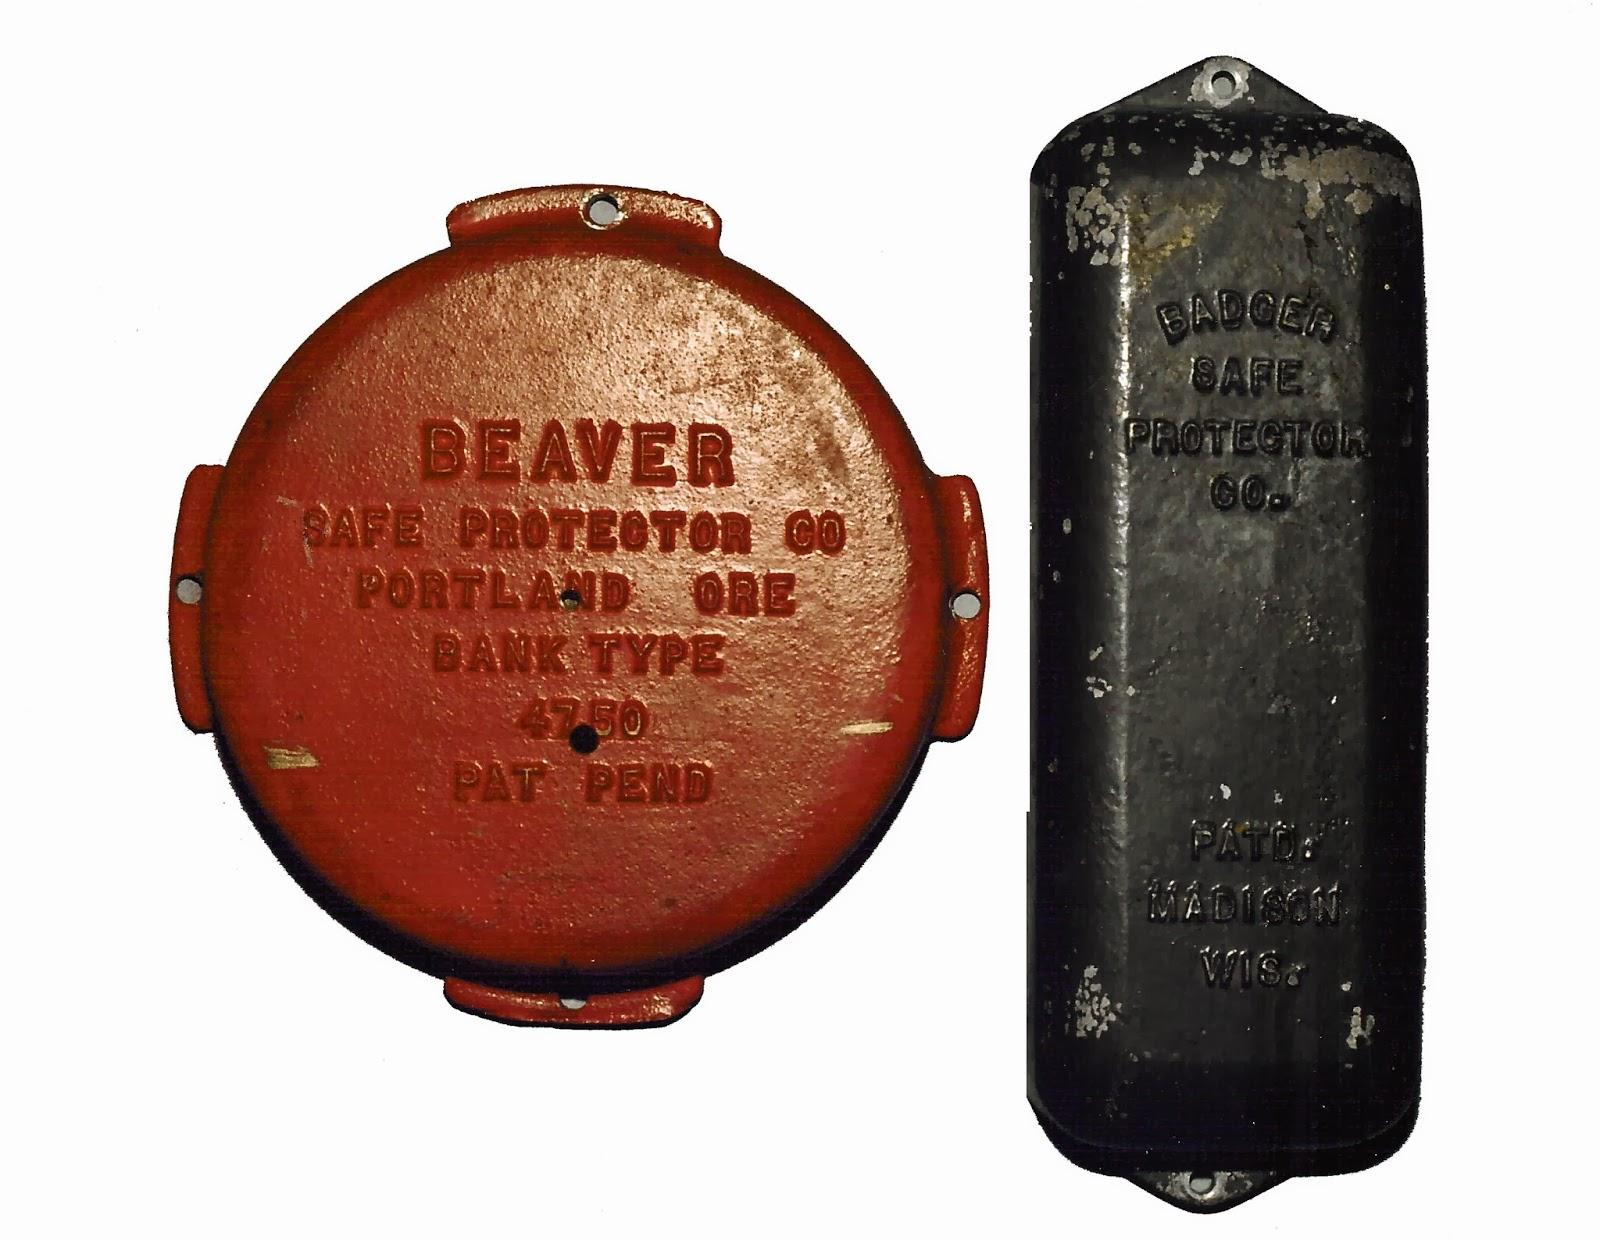 Antique Safe Prices & Values: